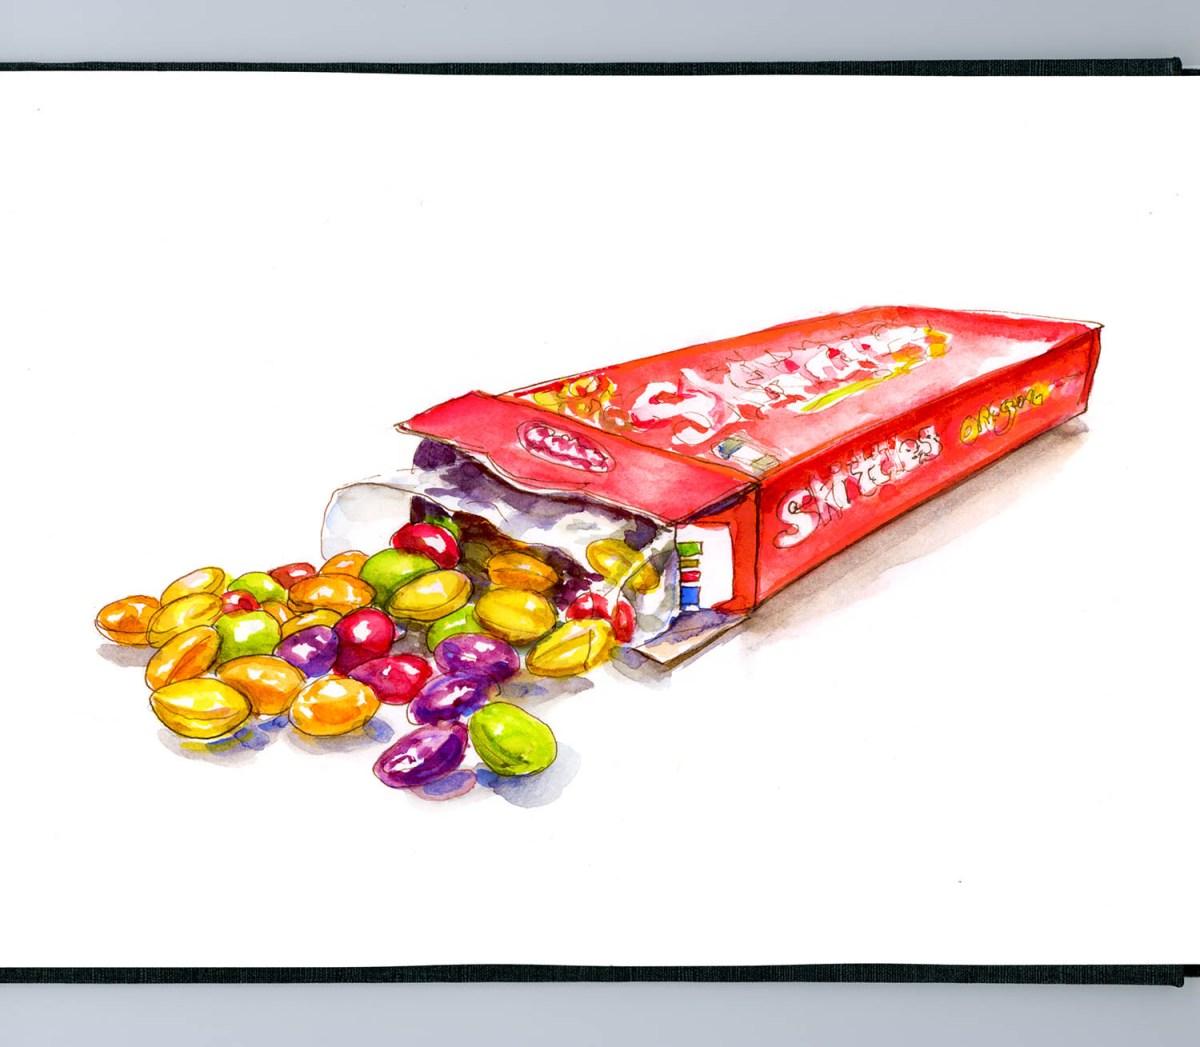 Day 17 - Snack VS Treat Skittles - #doodlewashApril2018 Doodlewash